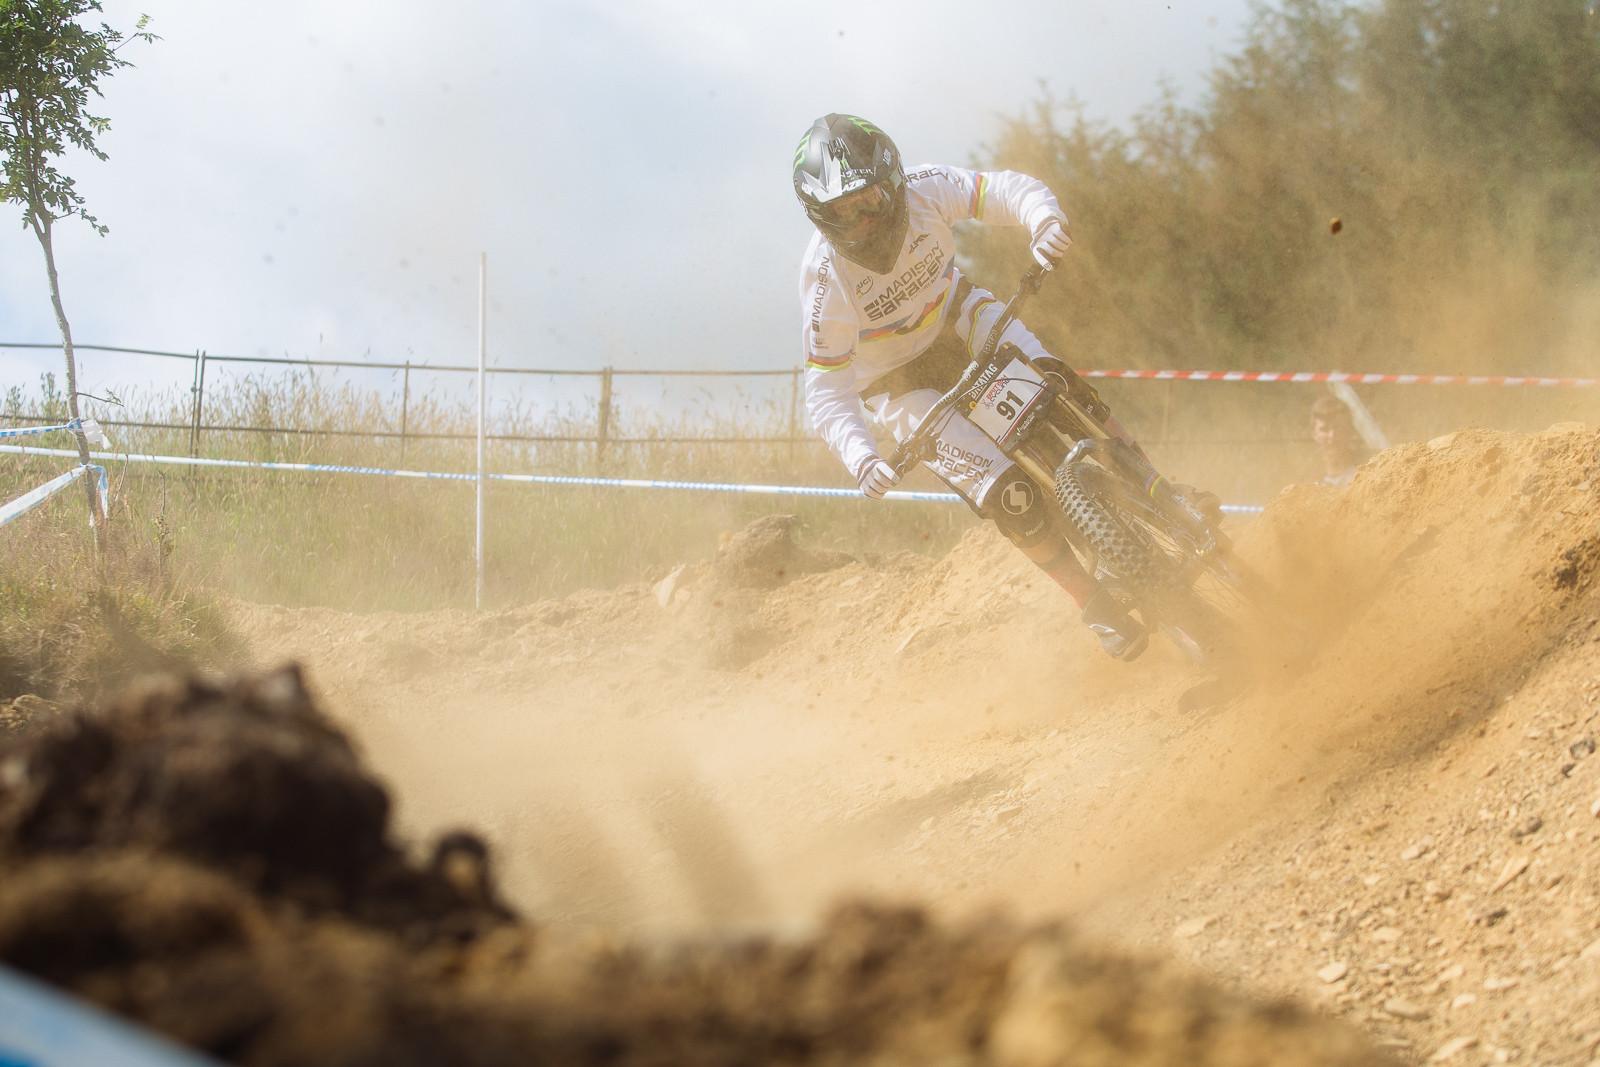 Manon Carpenter - 2015 British National Champs Downhill - 2015 British National Champs Downhill Photos - Mountain Biking Pictures - Vital MTB